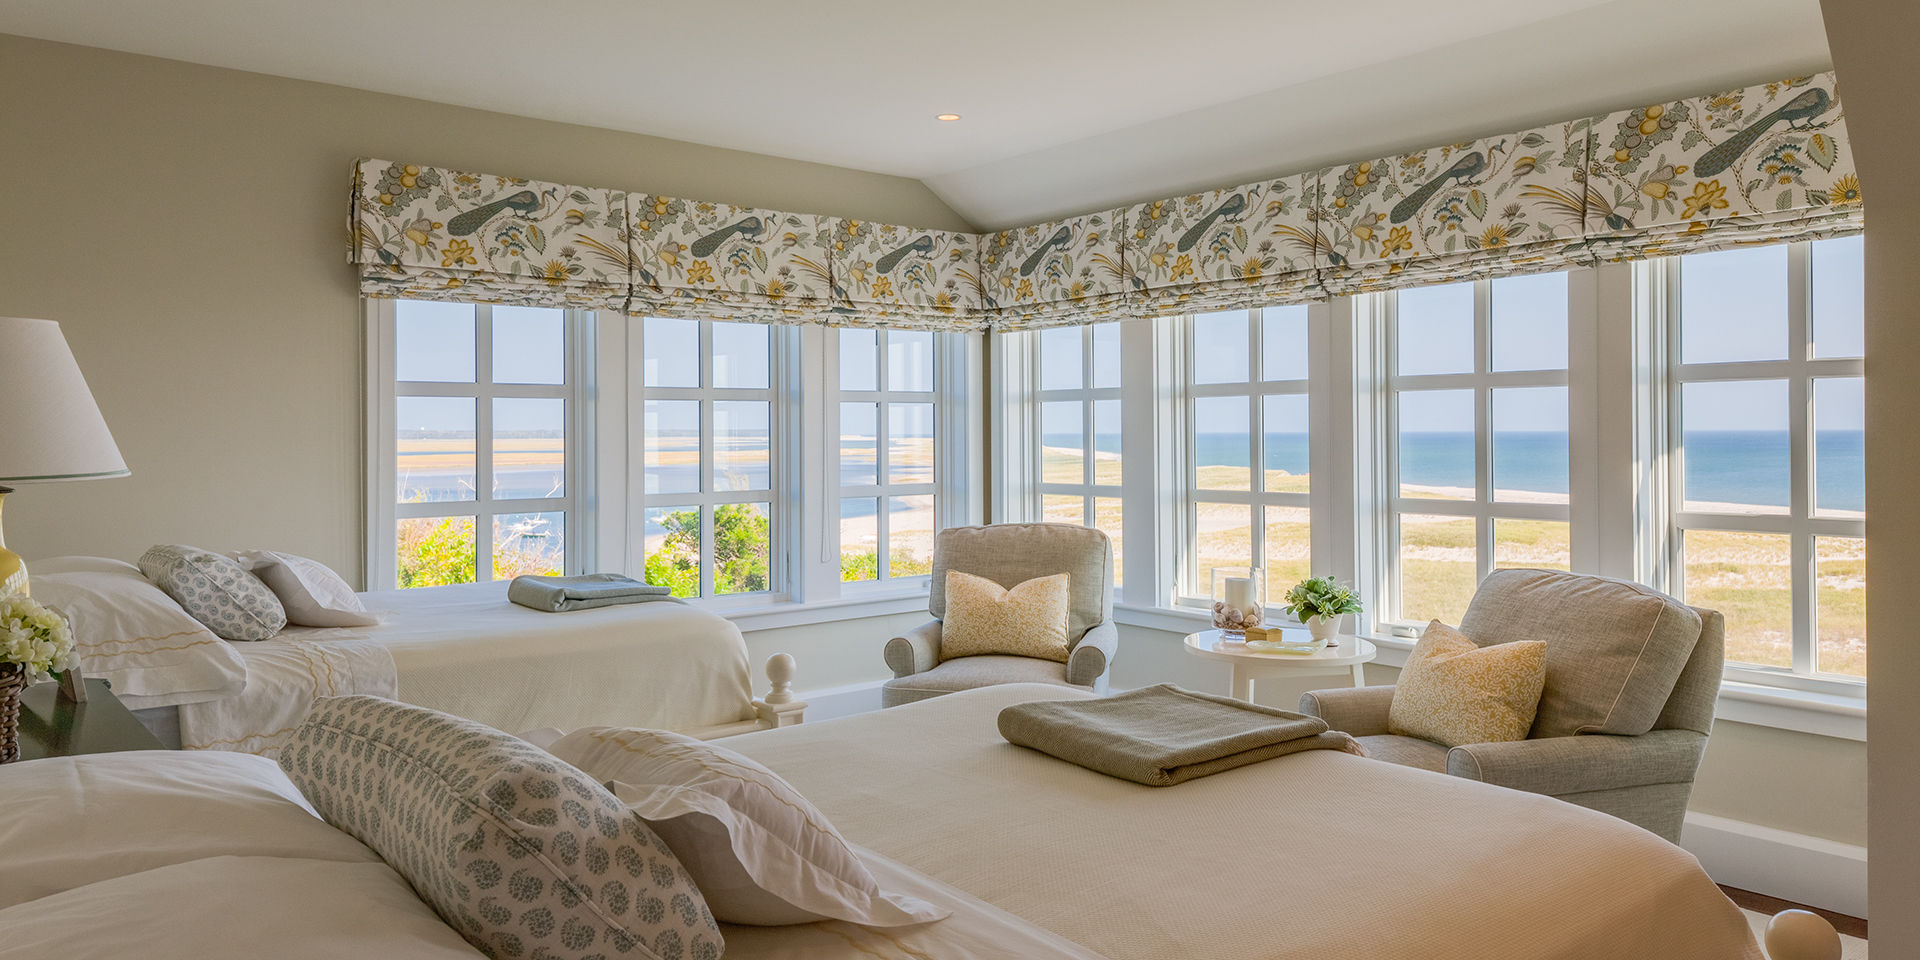 Cape Cod Beach House-A Beautiful Beach House on a Scenic Bluff in Nauset Beach 14.jpg